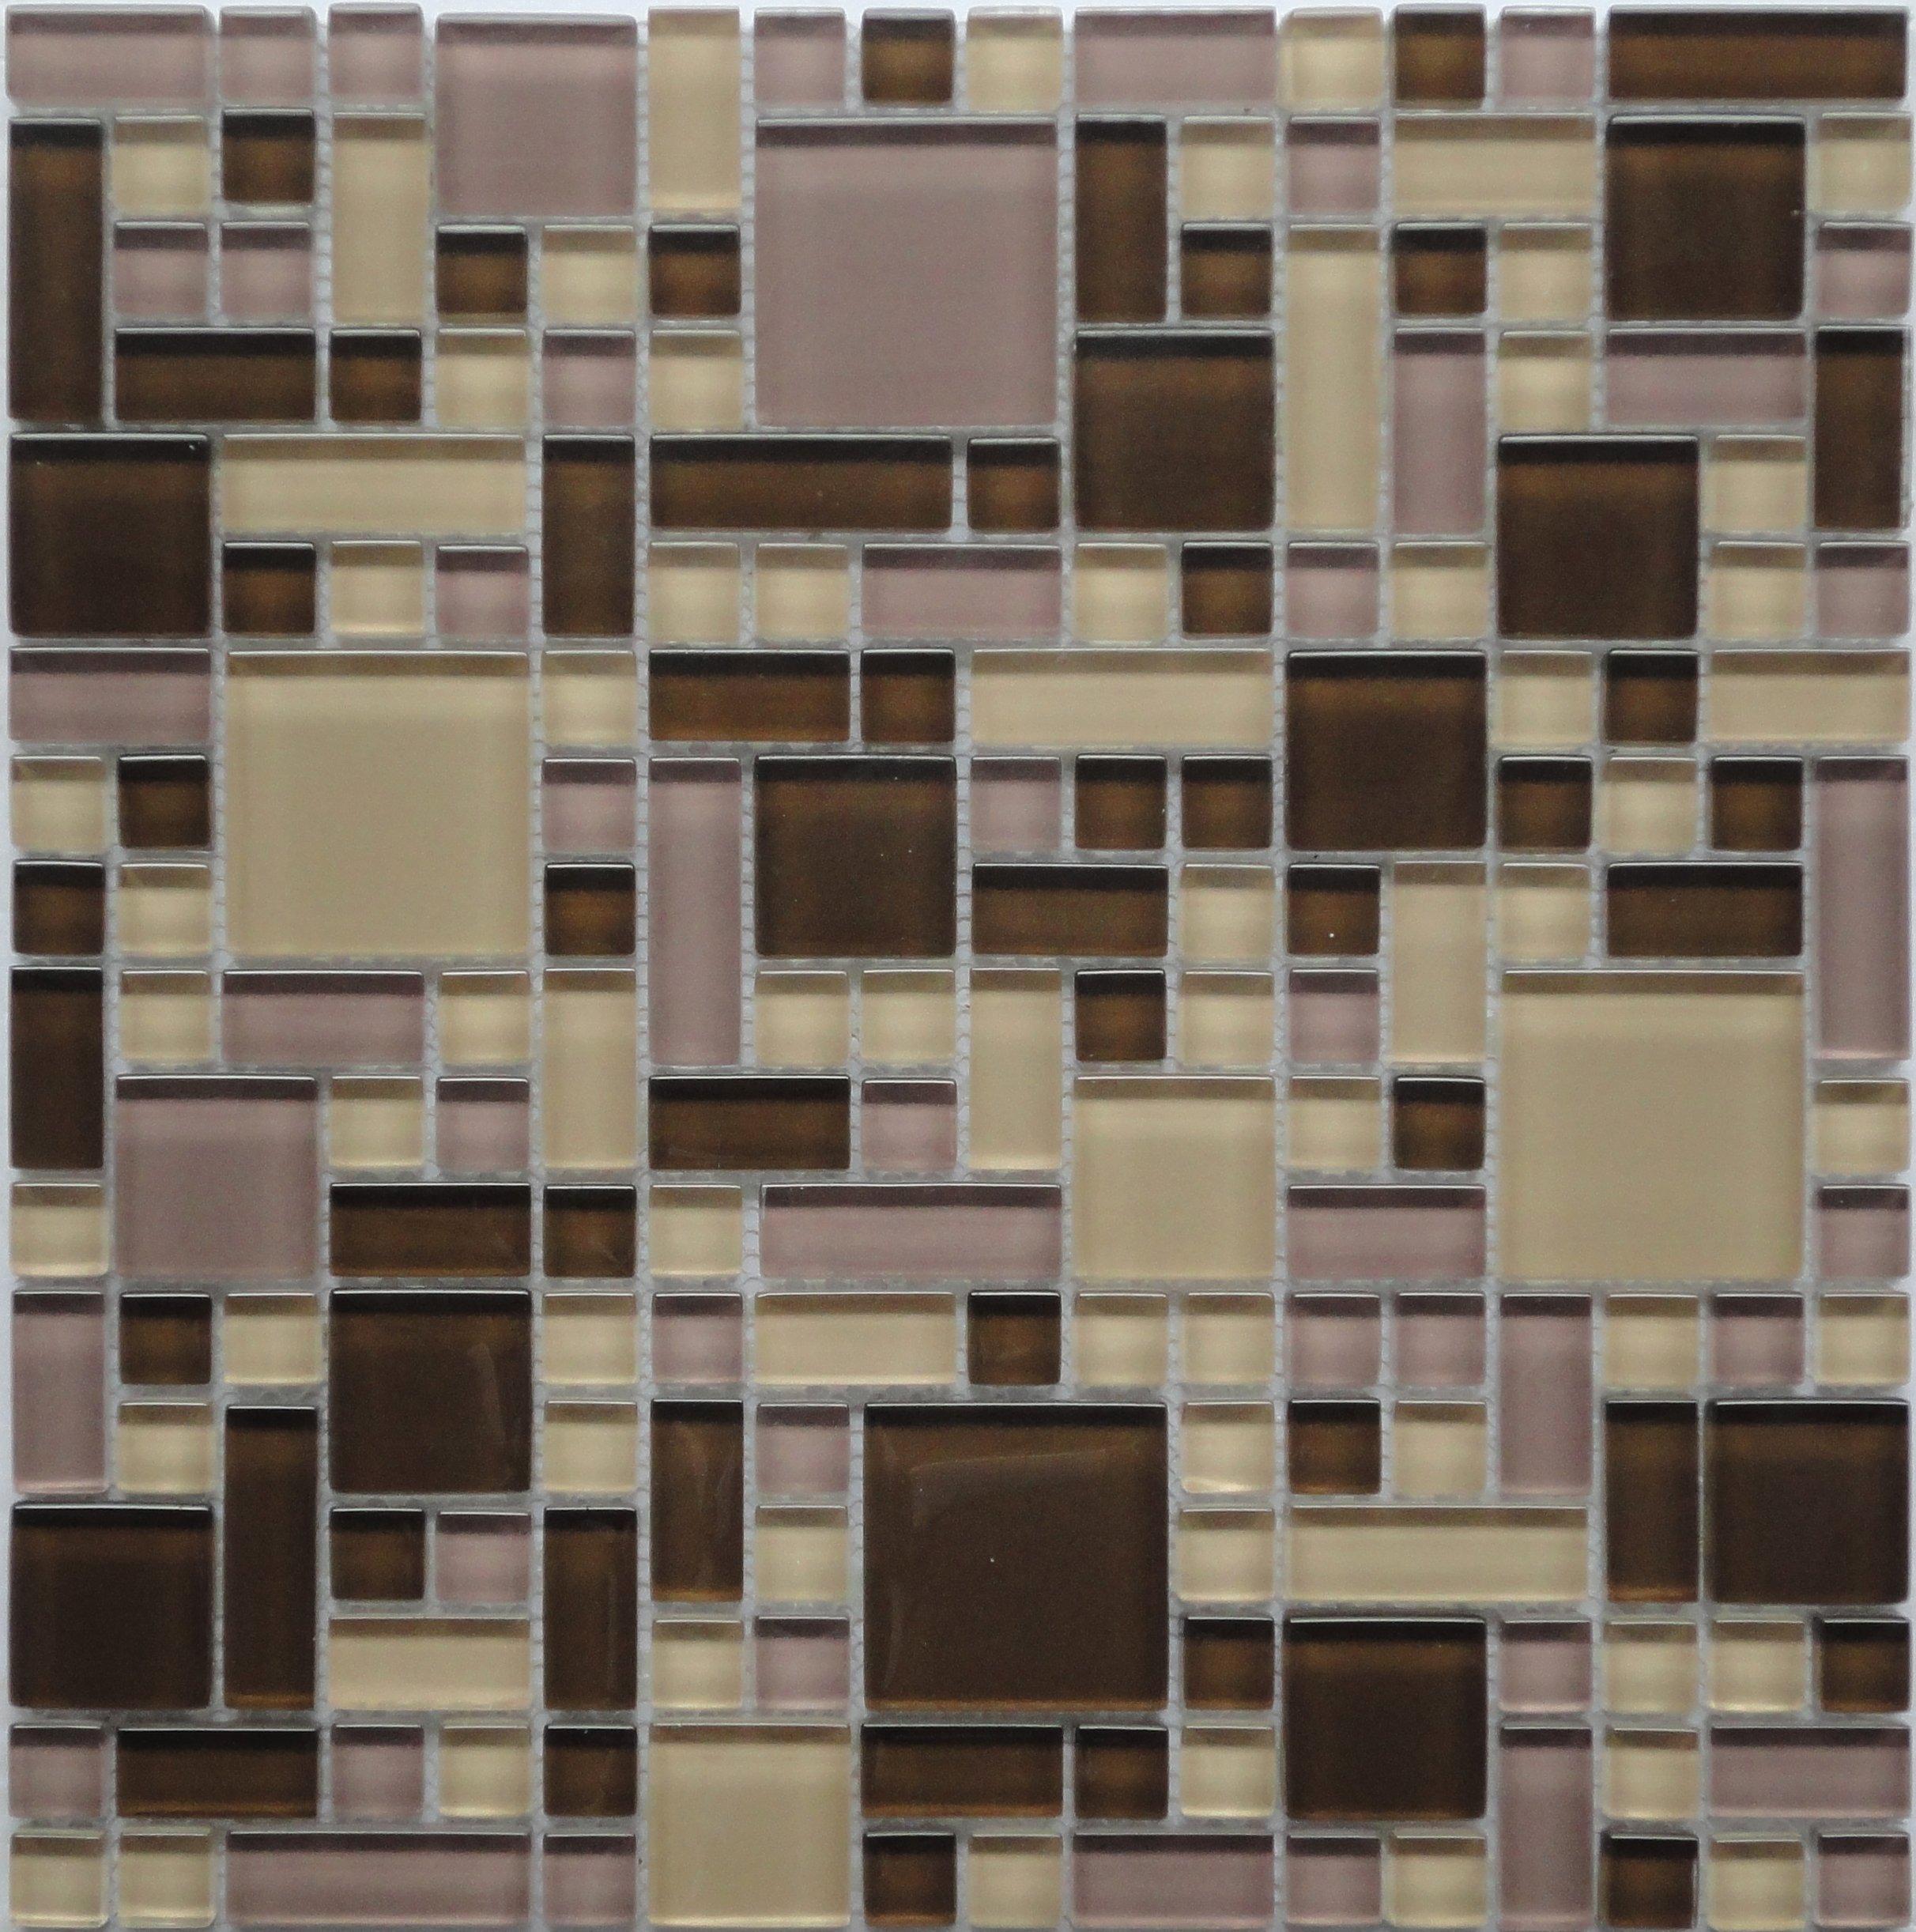 Cassava Root (GP03) Brown Beige Purple Blend Glass Backsplash Tiles for Kitchen Bathroom Wall Puzzle Mosaic Design (1 Box / 11 Sheets)